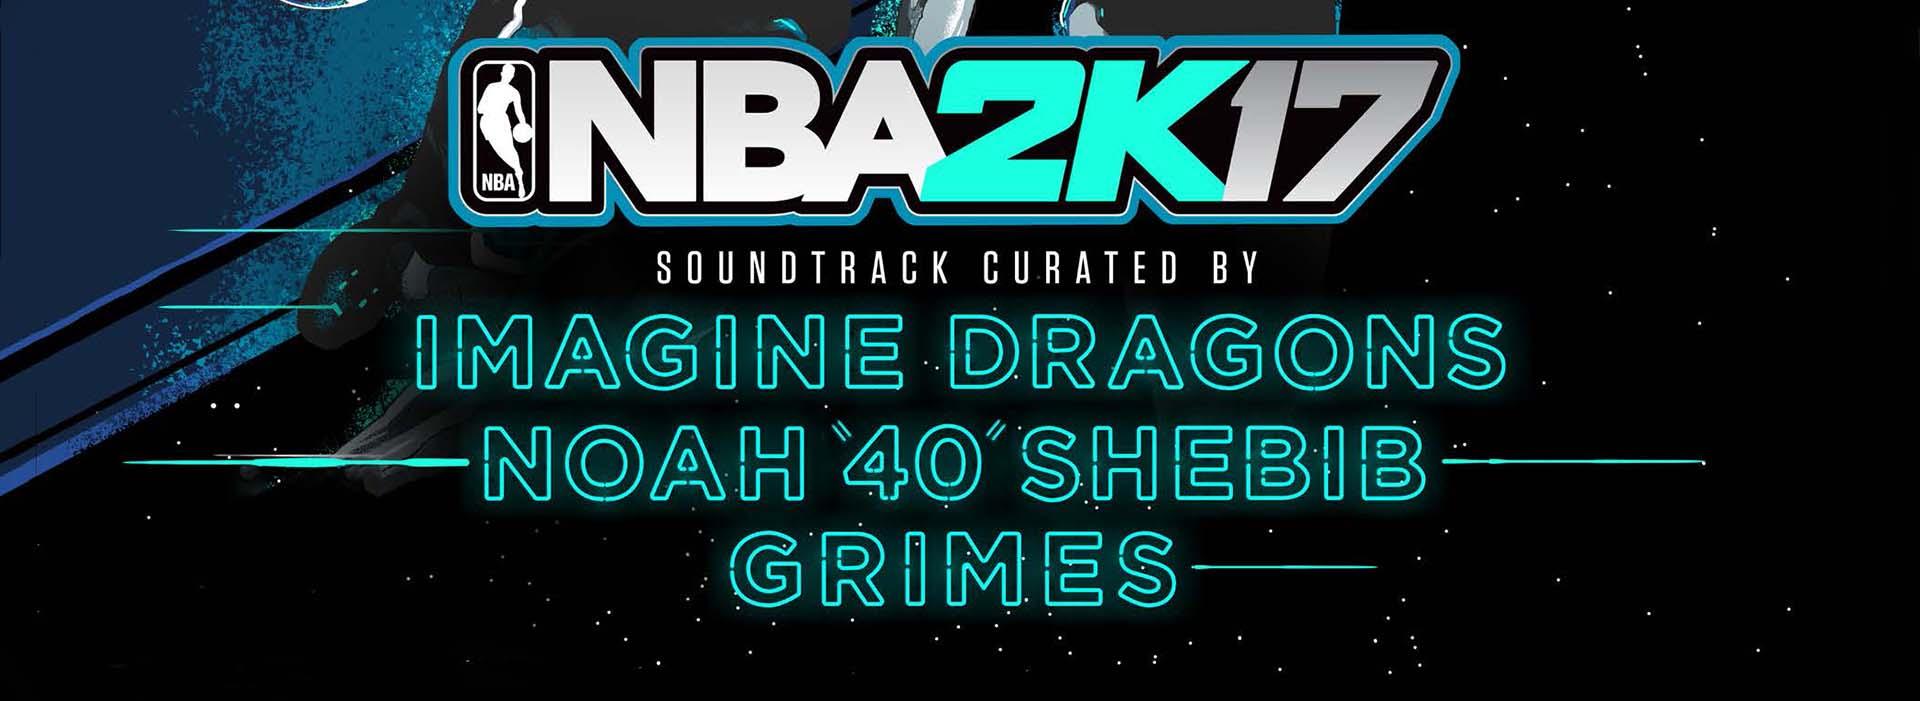 NBA2K17_soundtrackposter_logo